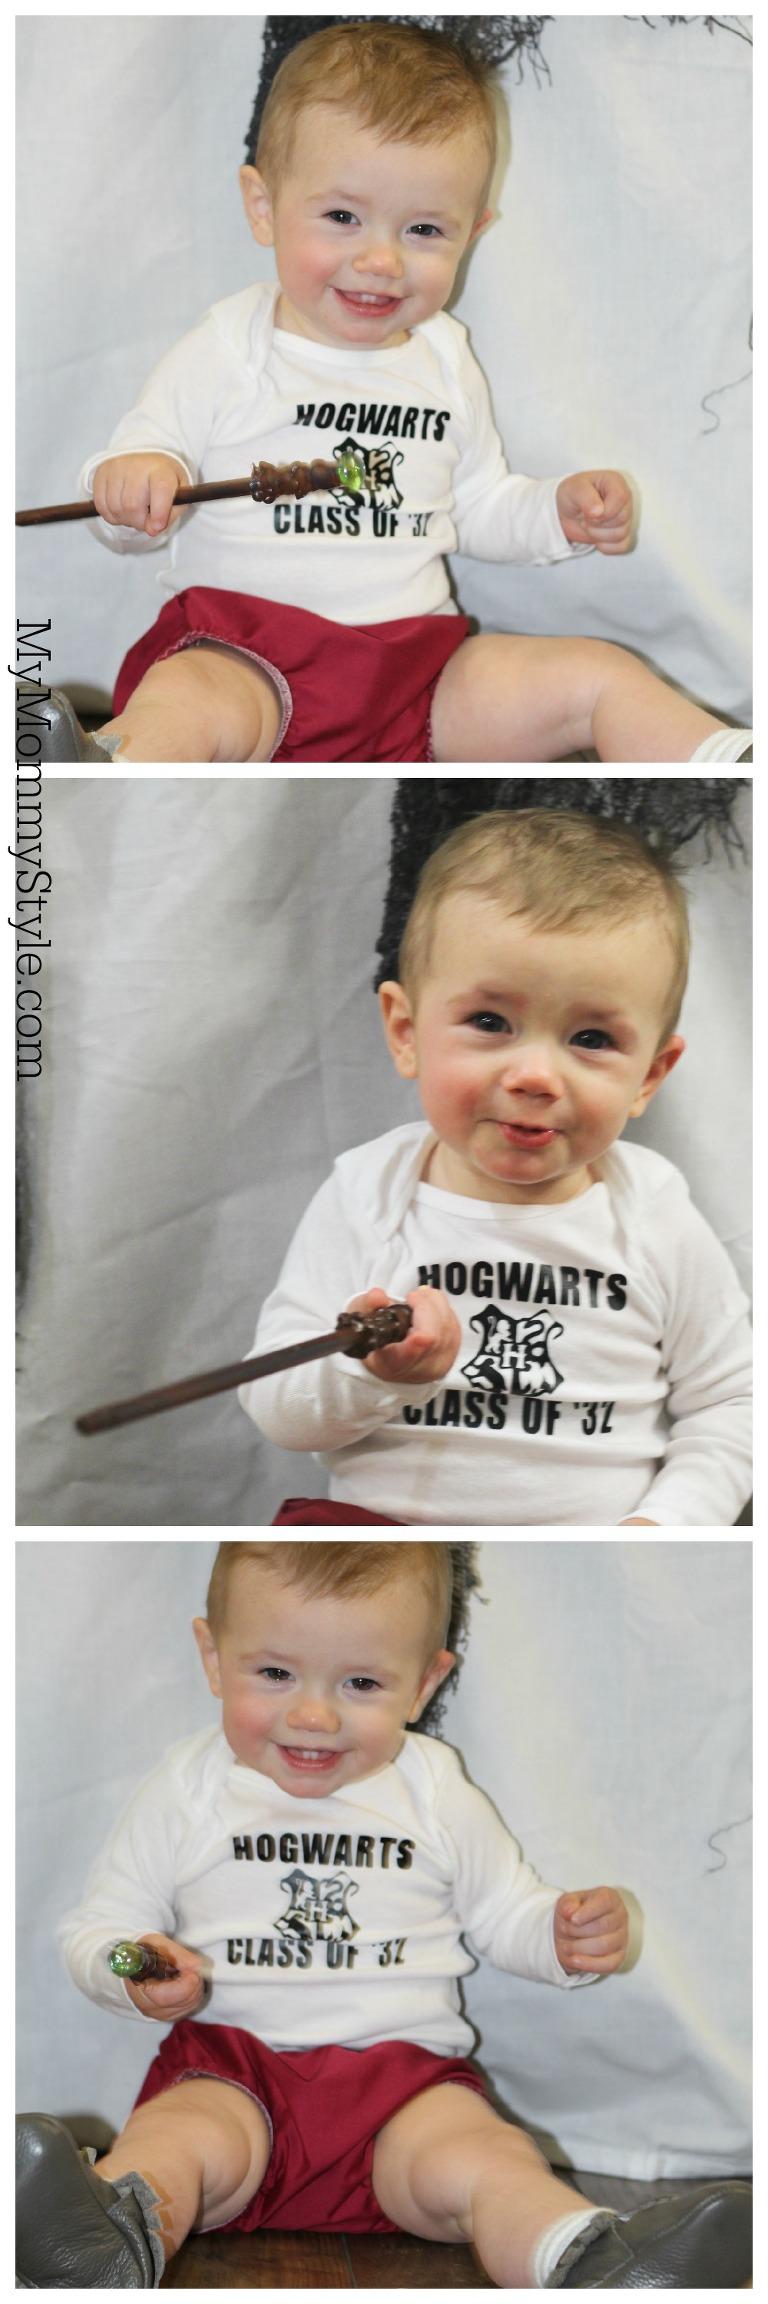 Harry Potter baby, Harry potter, my mommy style, raegun ramblings etsy